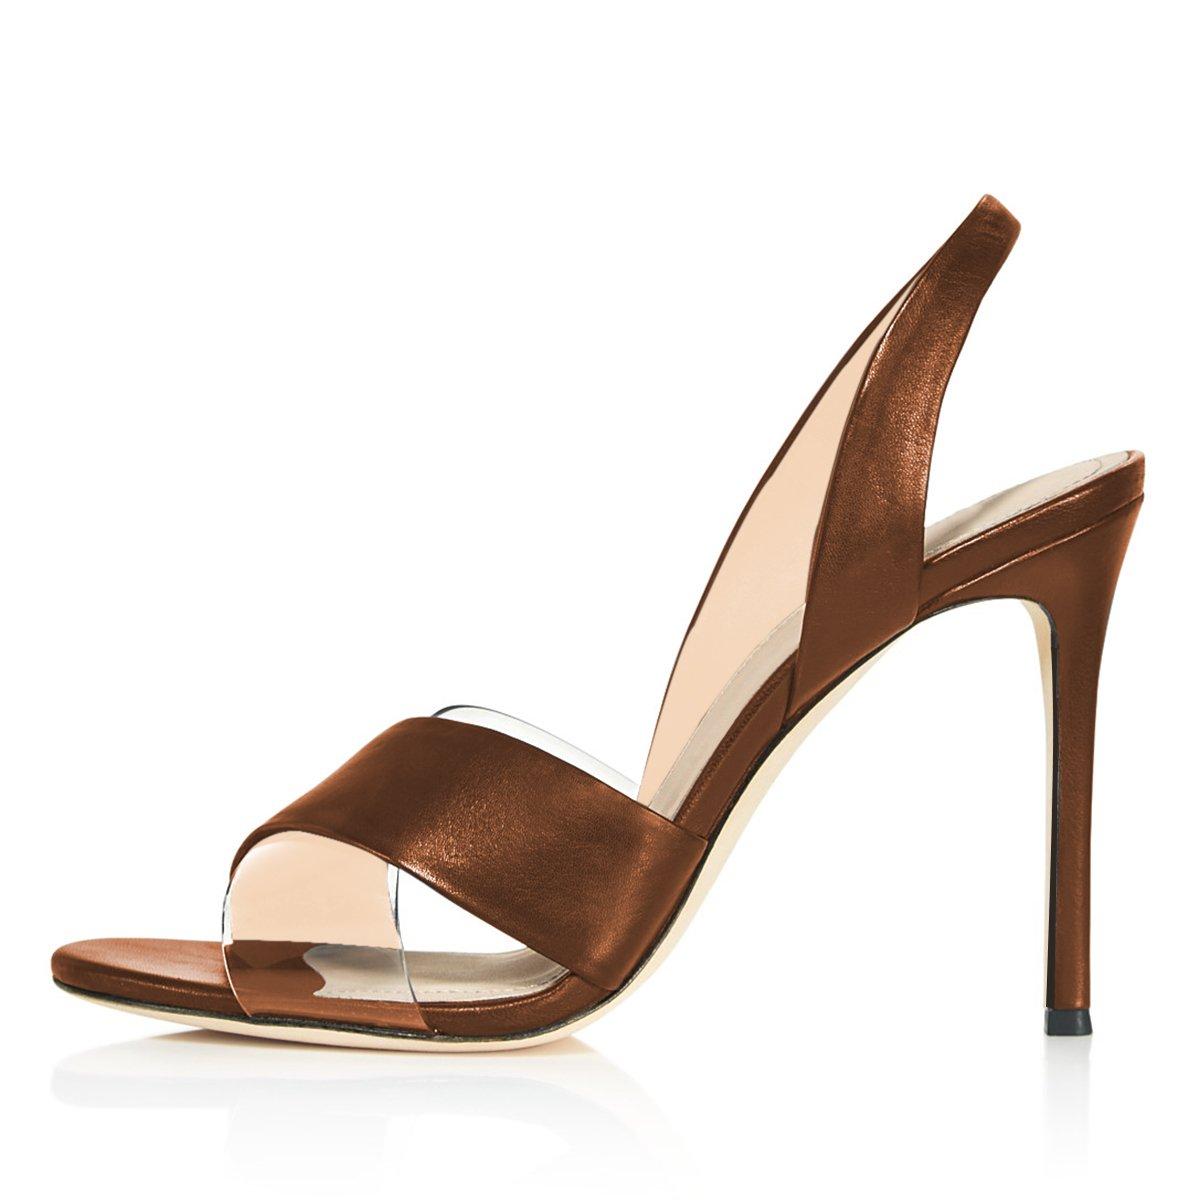 YDN Women Peep Toe High Heel Slingback Sandals Slip on Stilettos Pumps Transparent Dress Shoes